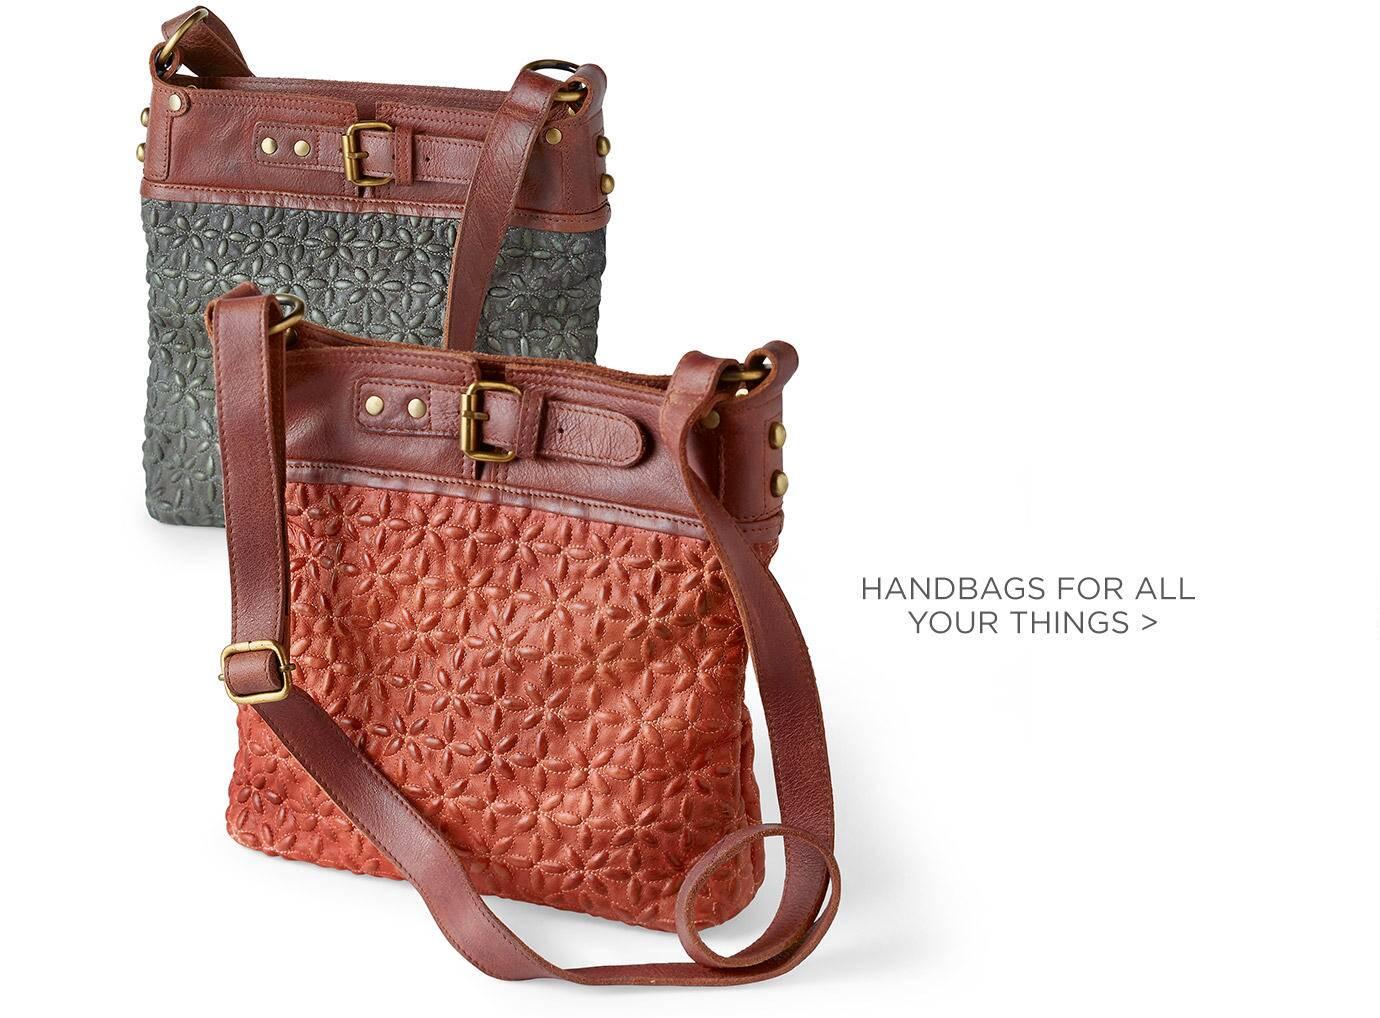 Handbags For All